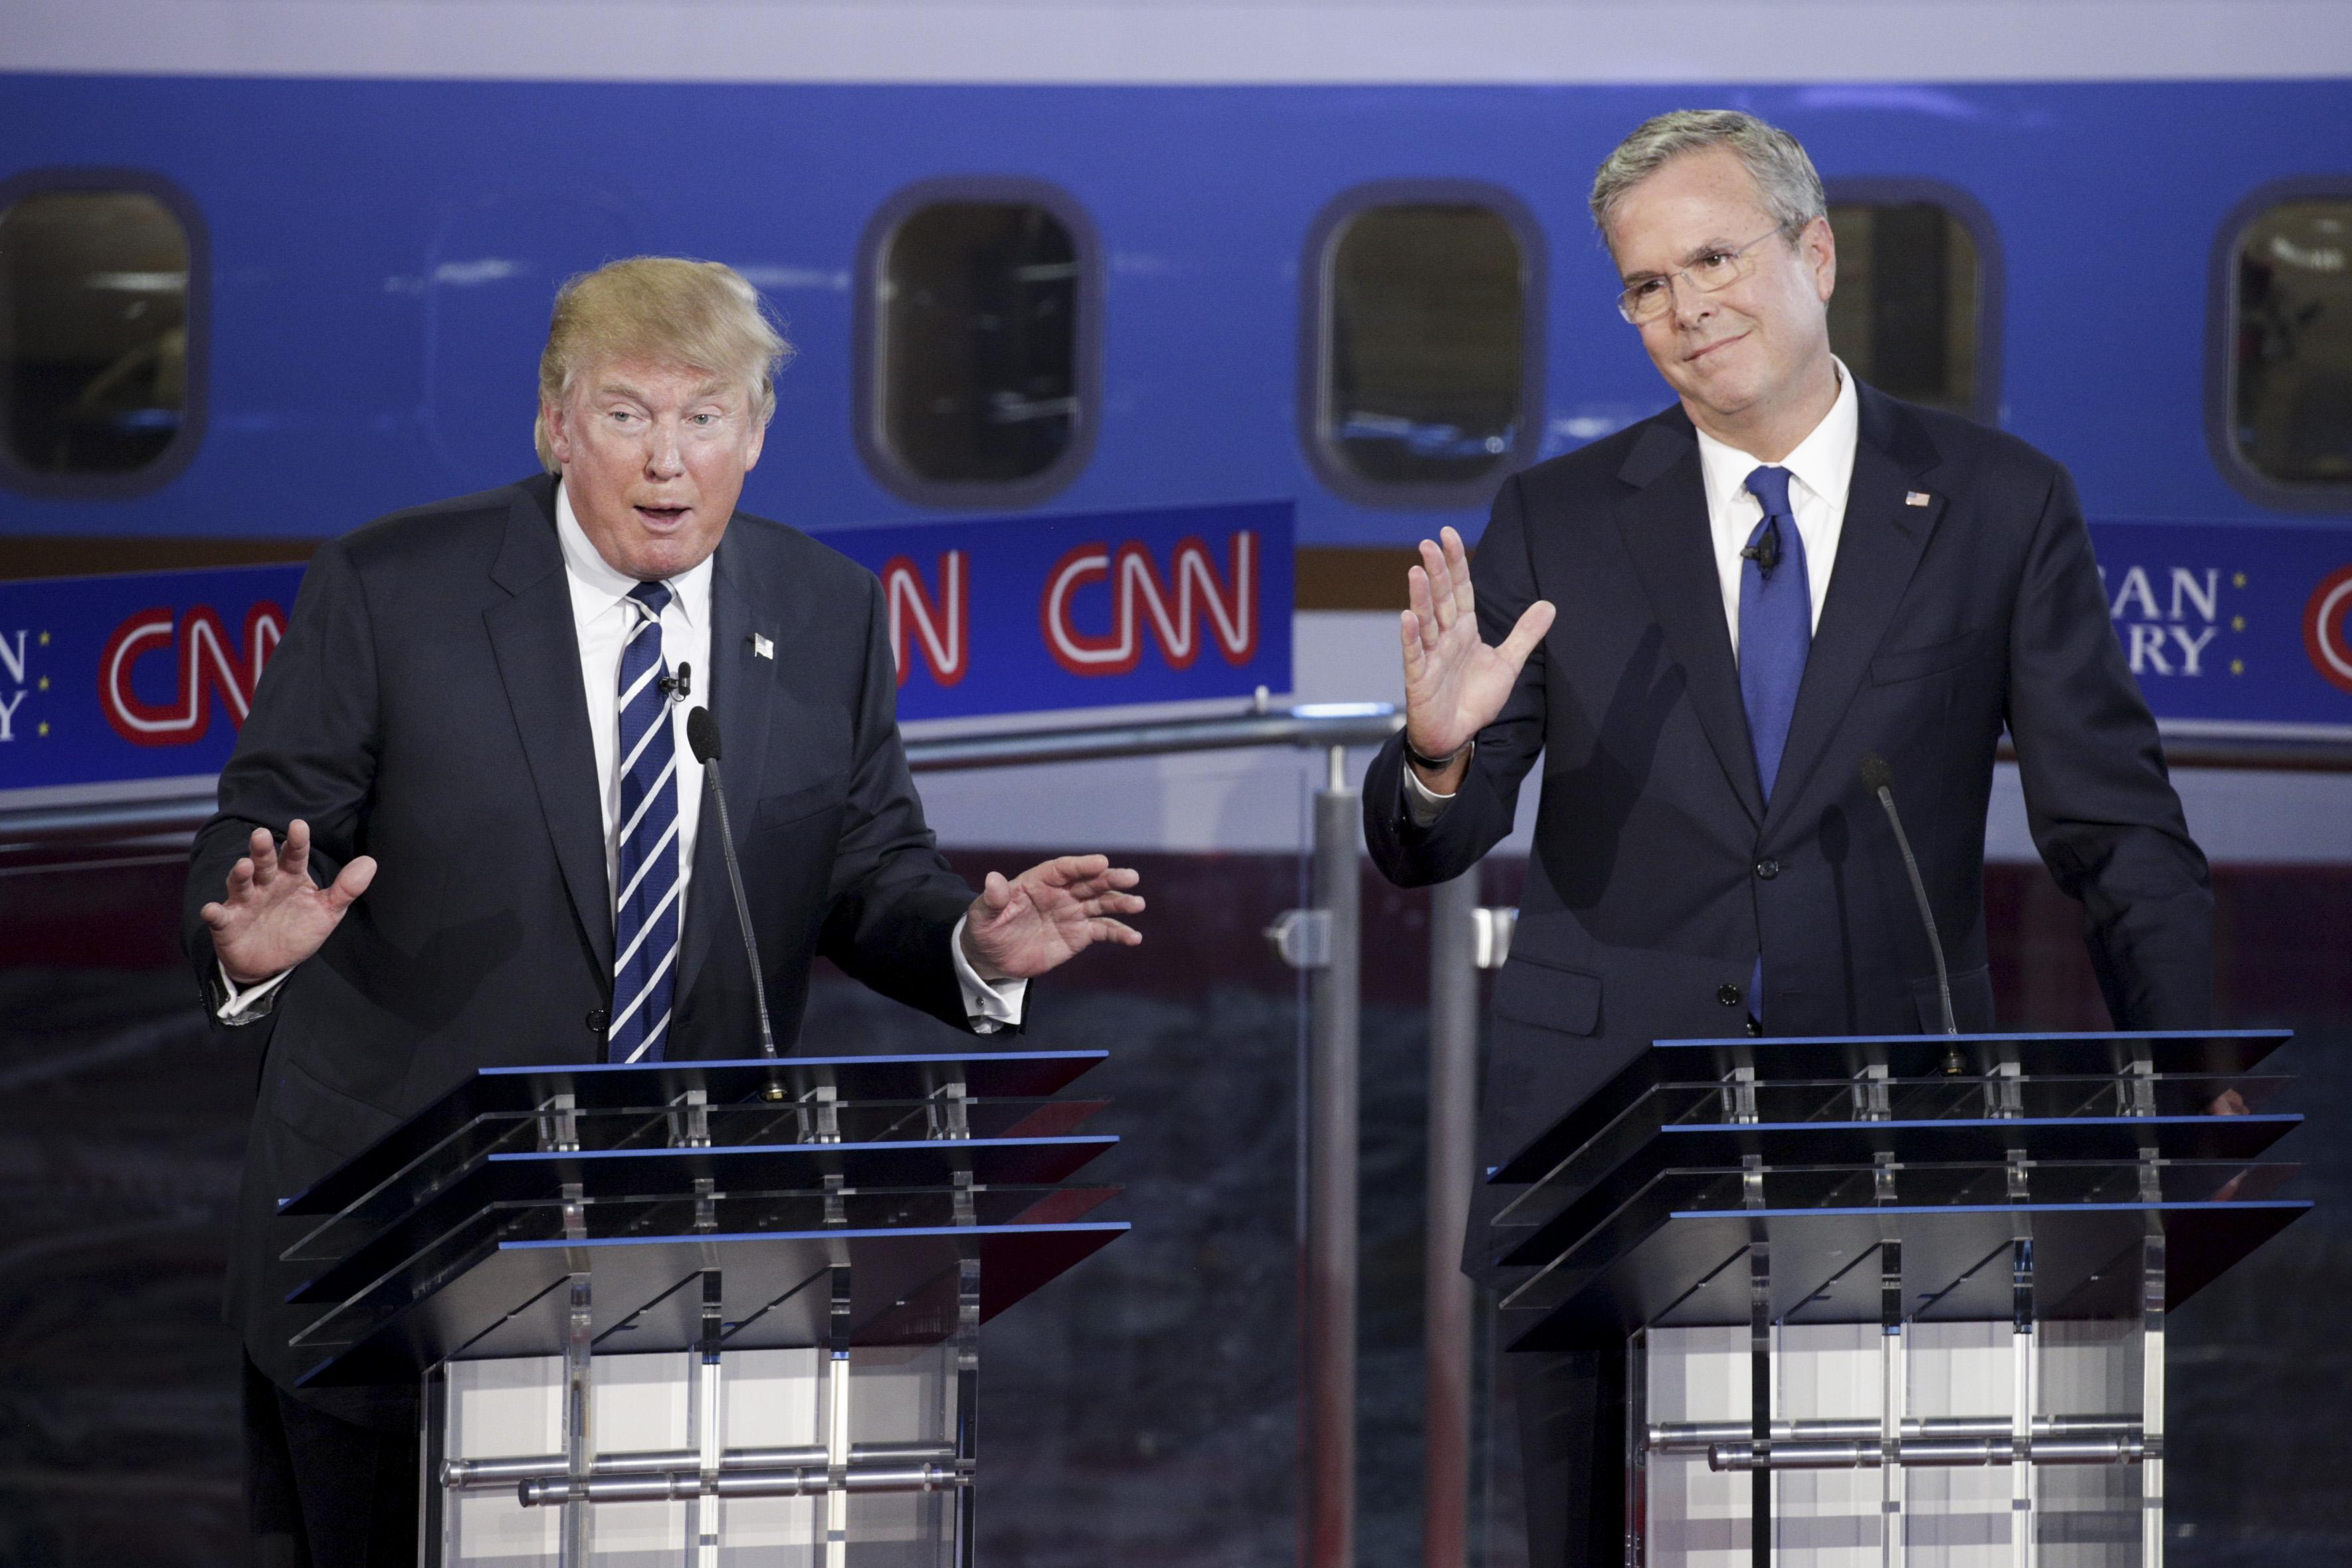 Donald Trump and Jeb Bush at CNN's Republican presidential debate in September